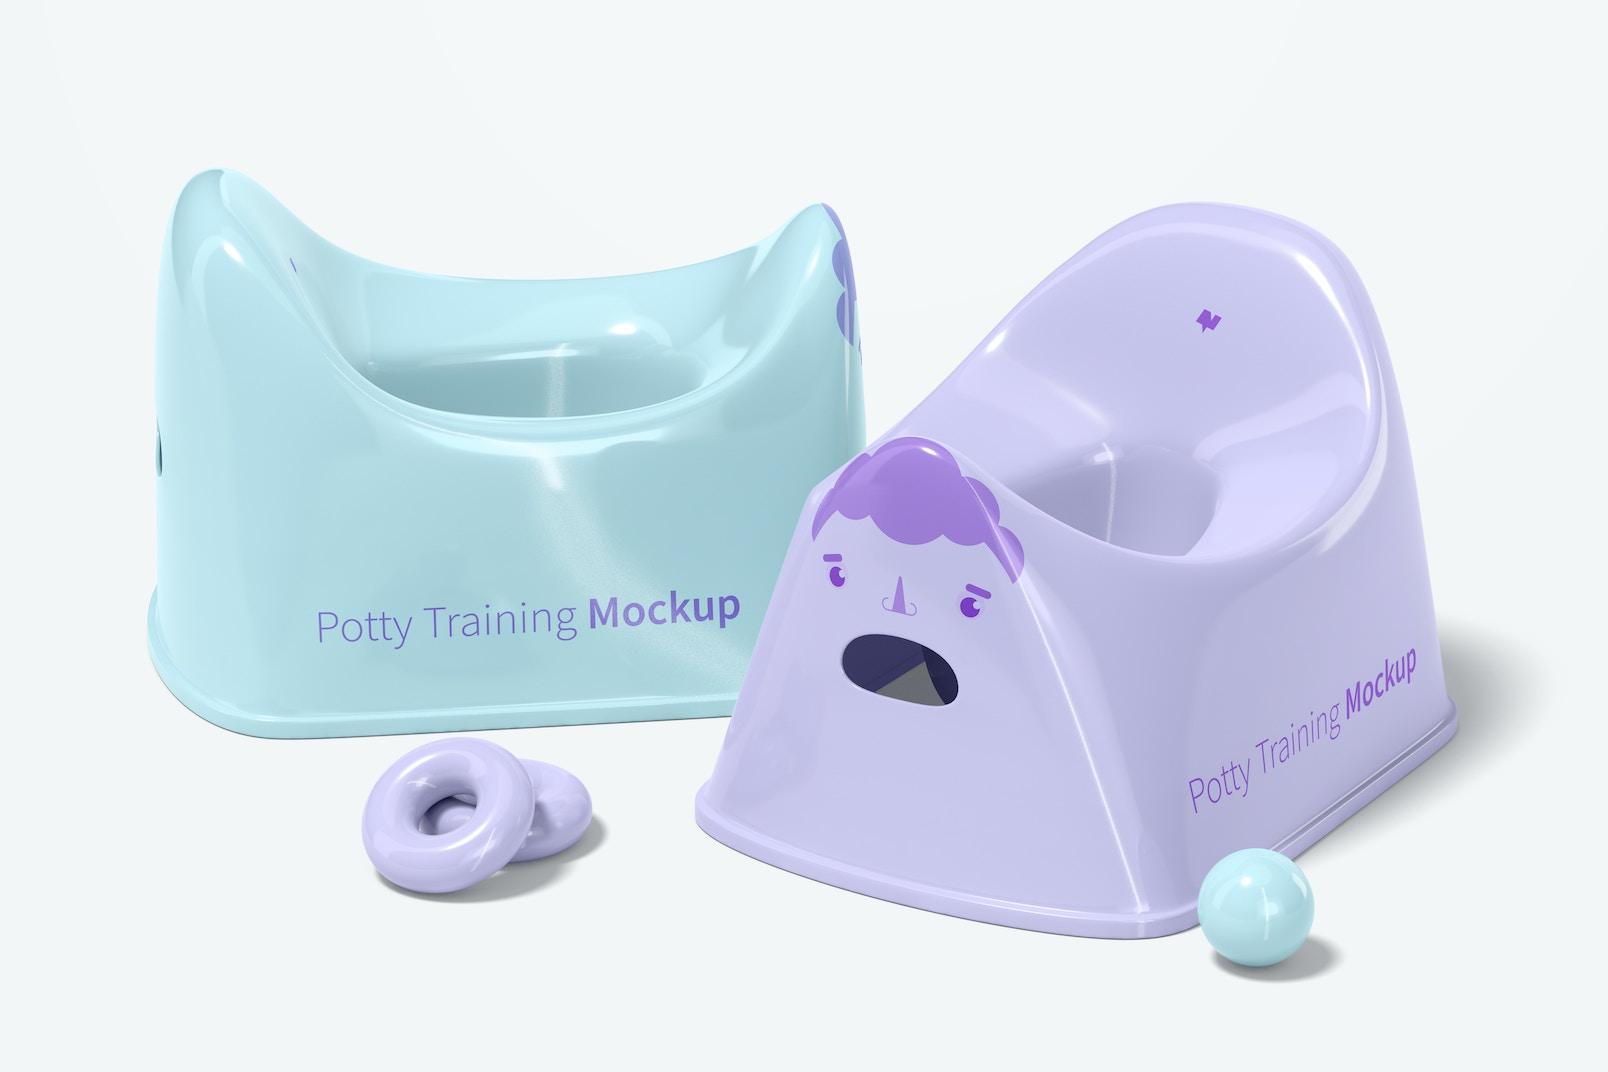 Potty Training Mockup, Perspective